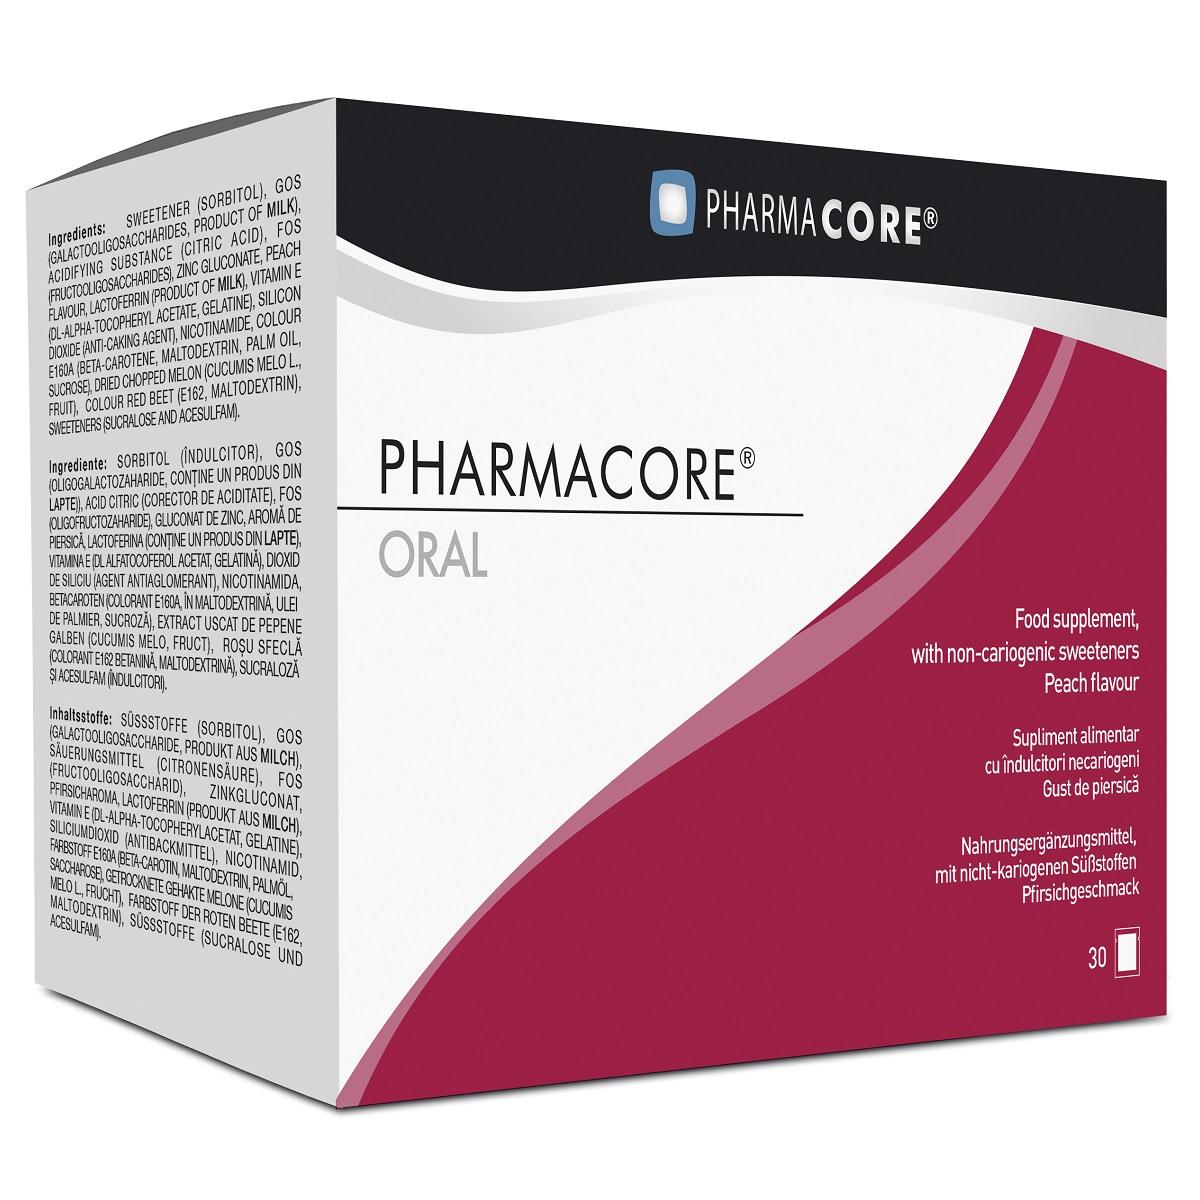 Supliment Oral Acne Control 90 mg, 30 plicuri, Pharmacore